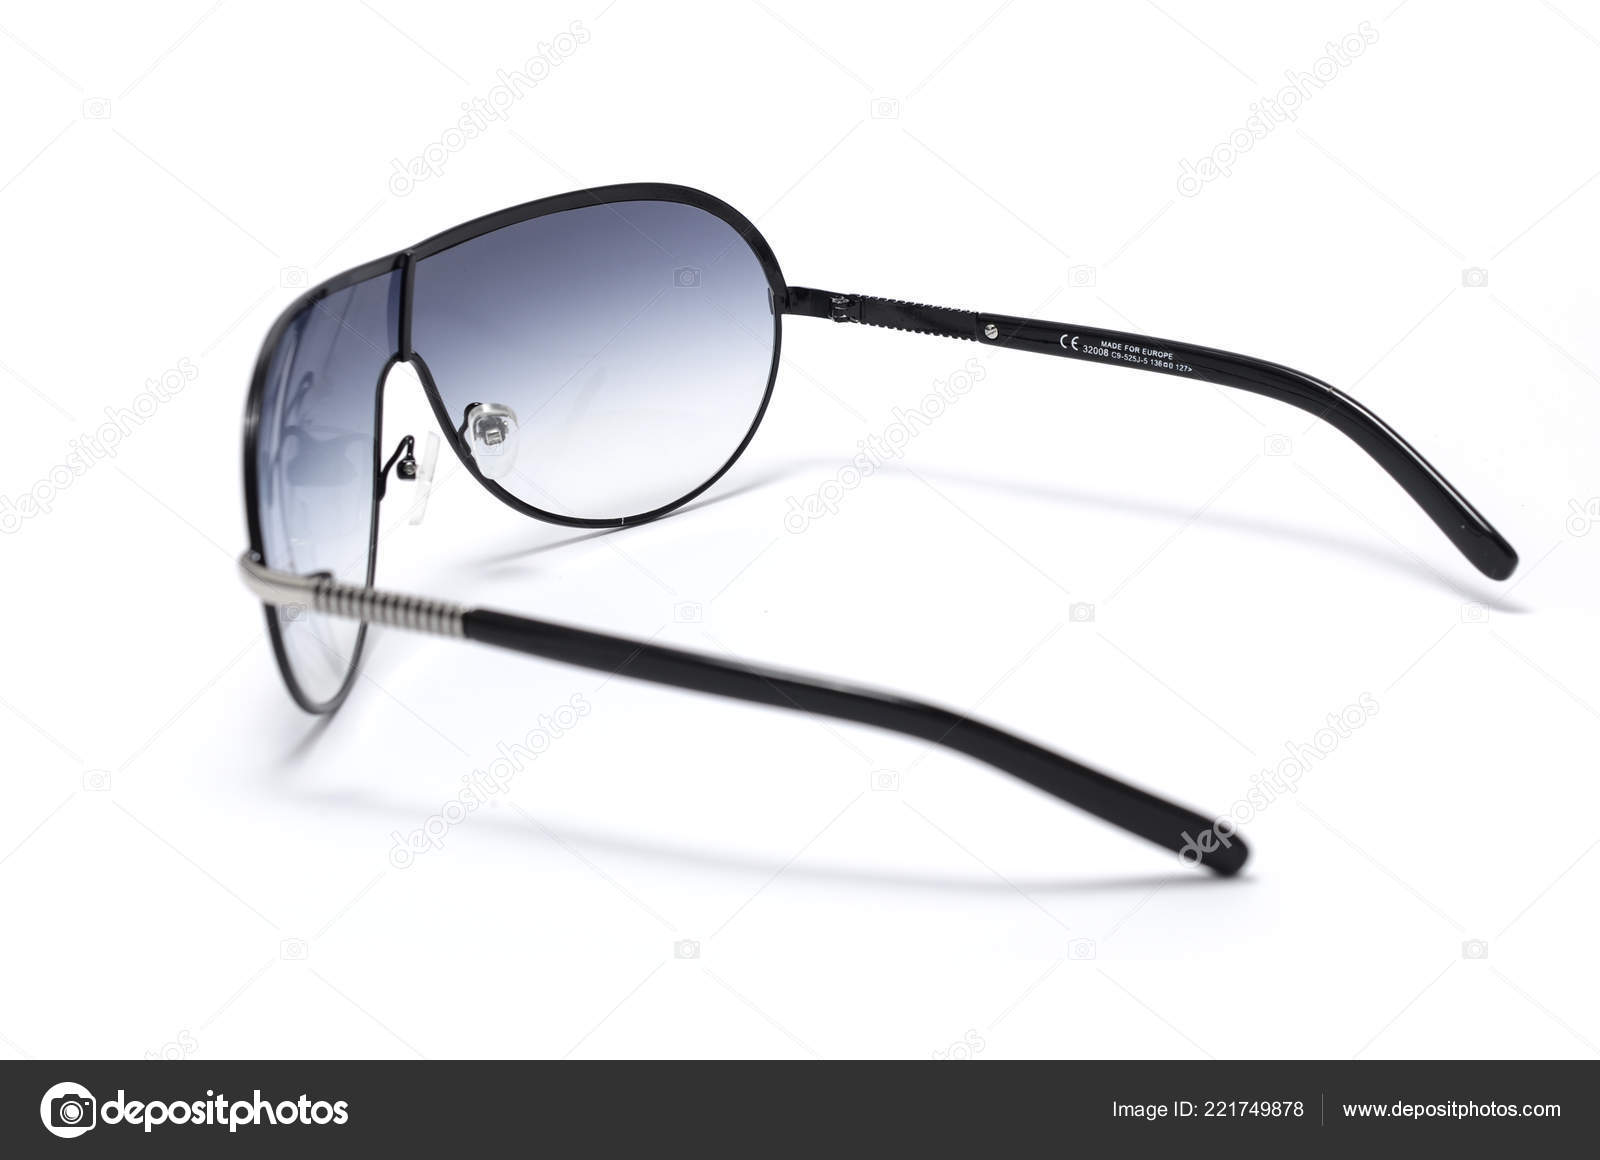 849414f91 Óculos Sol Masculino Armação Metal Isolado Branco — Fotografia de Stock